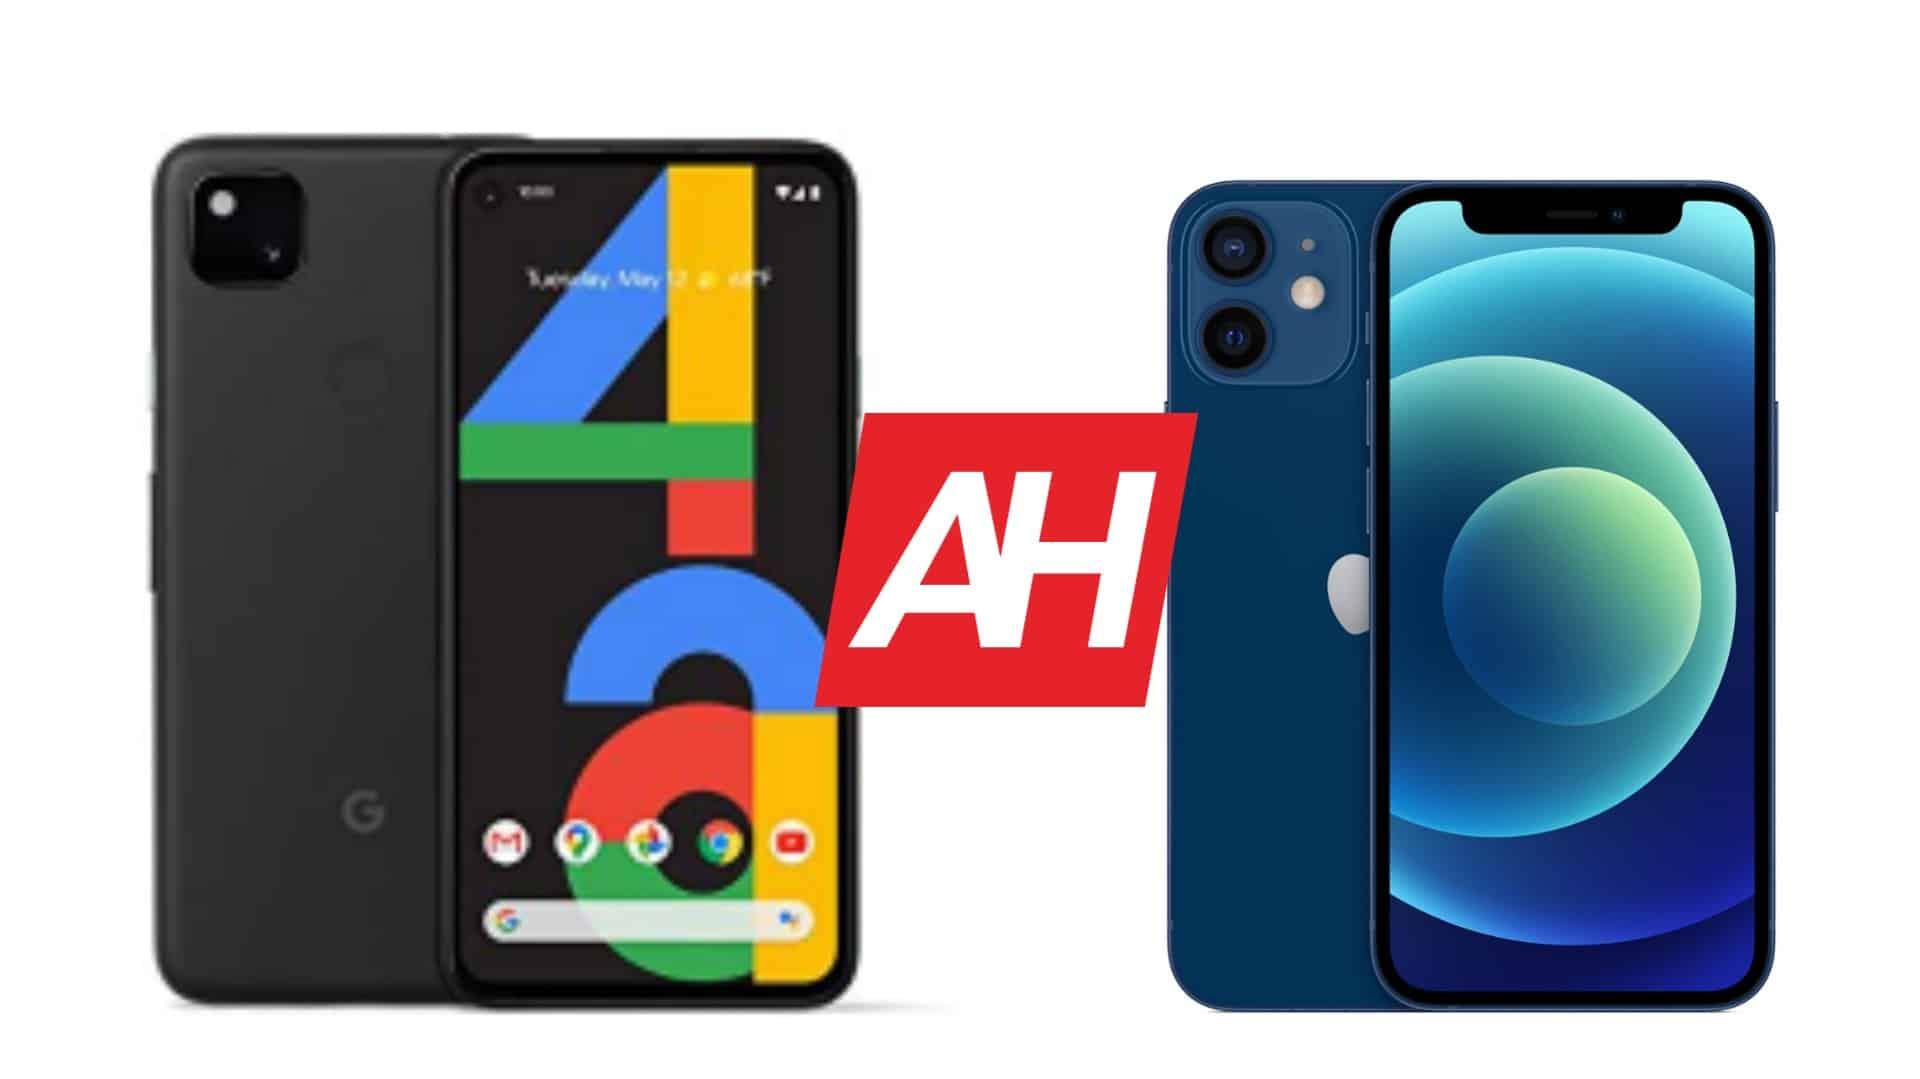 Phone Comparisons Google Pixel 4a Vs Apple Iphone 12 Mini